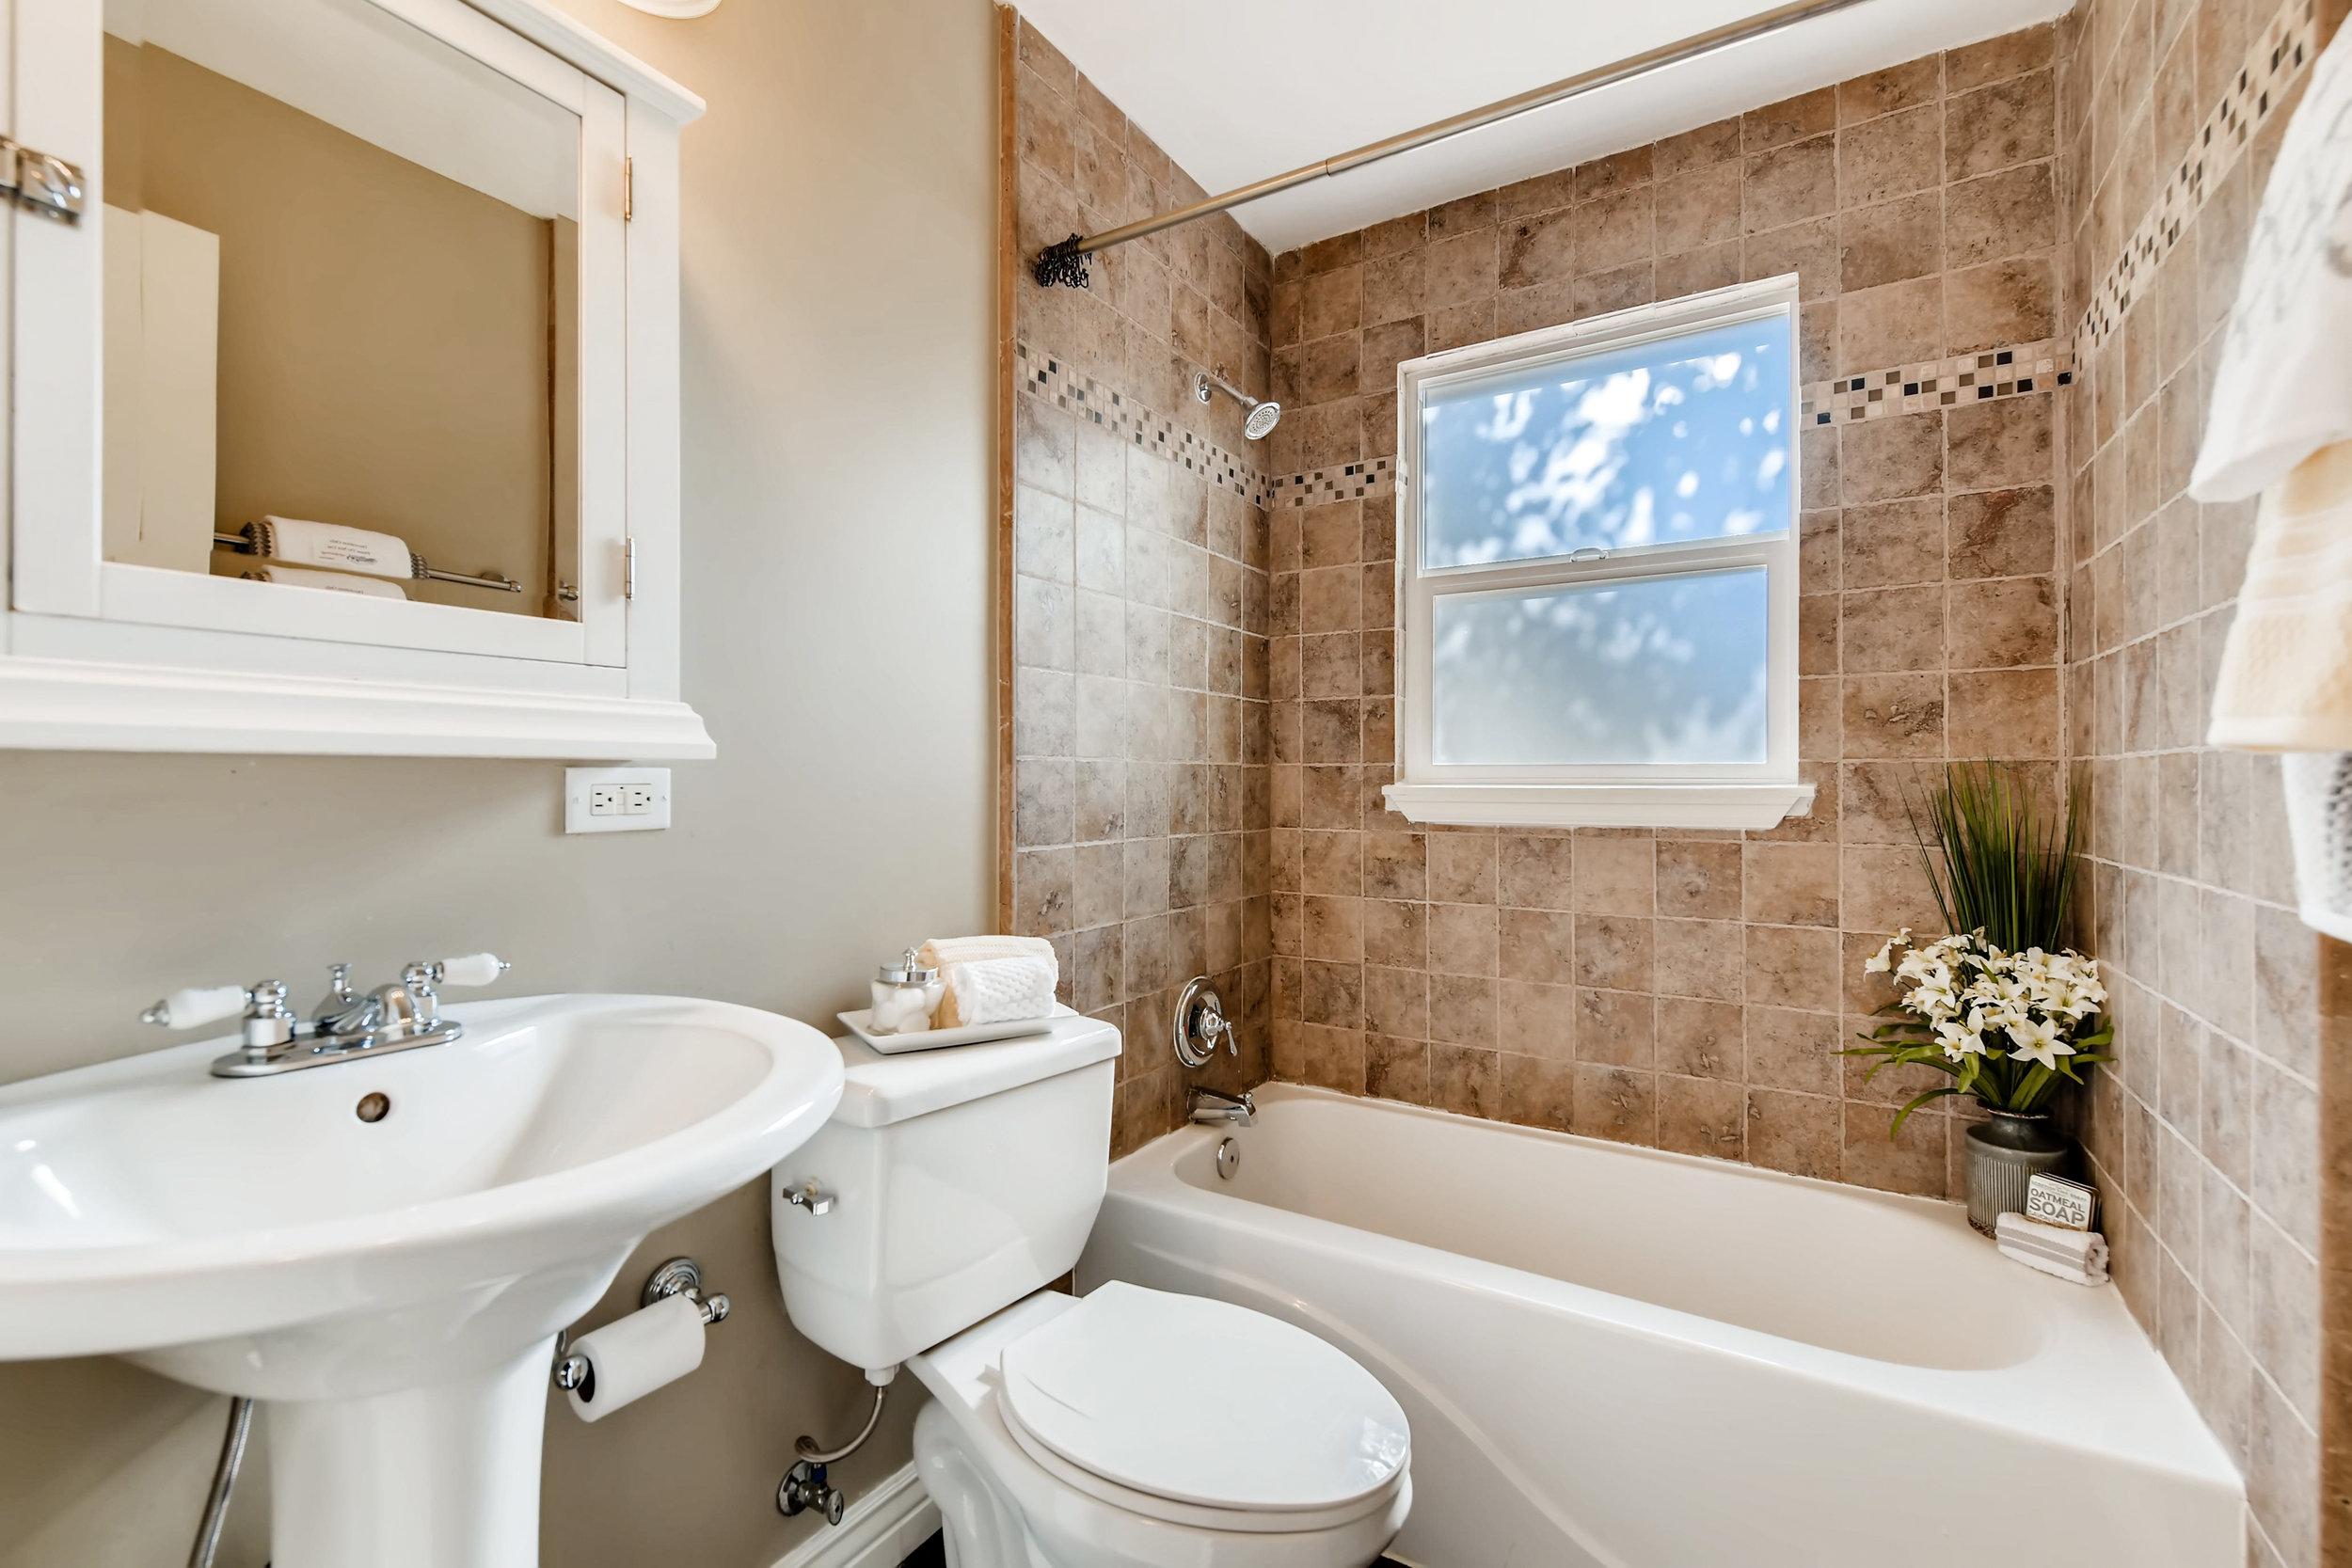 3635 Josephine St Denver CO-print-017-011-Master Bathroom-3600x2401-300dpi.jpg